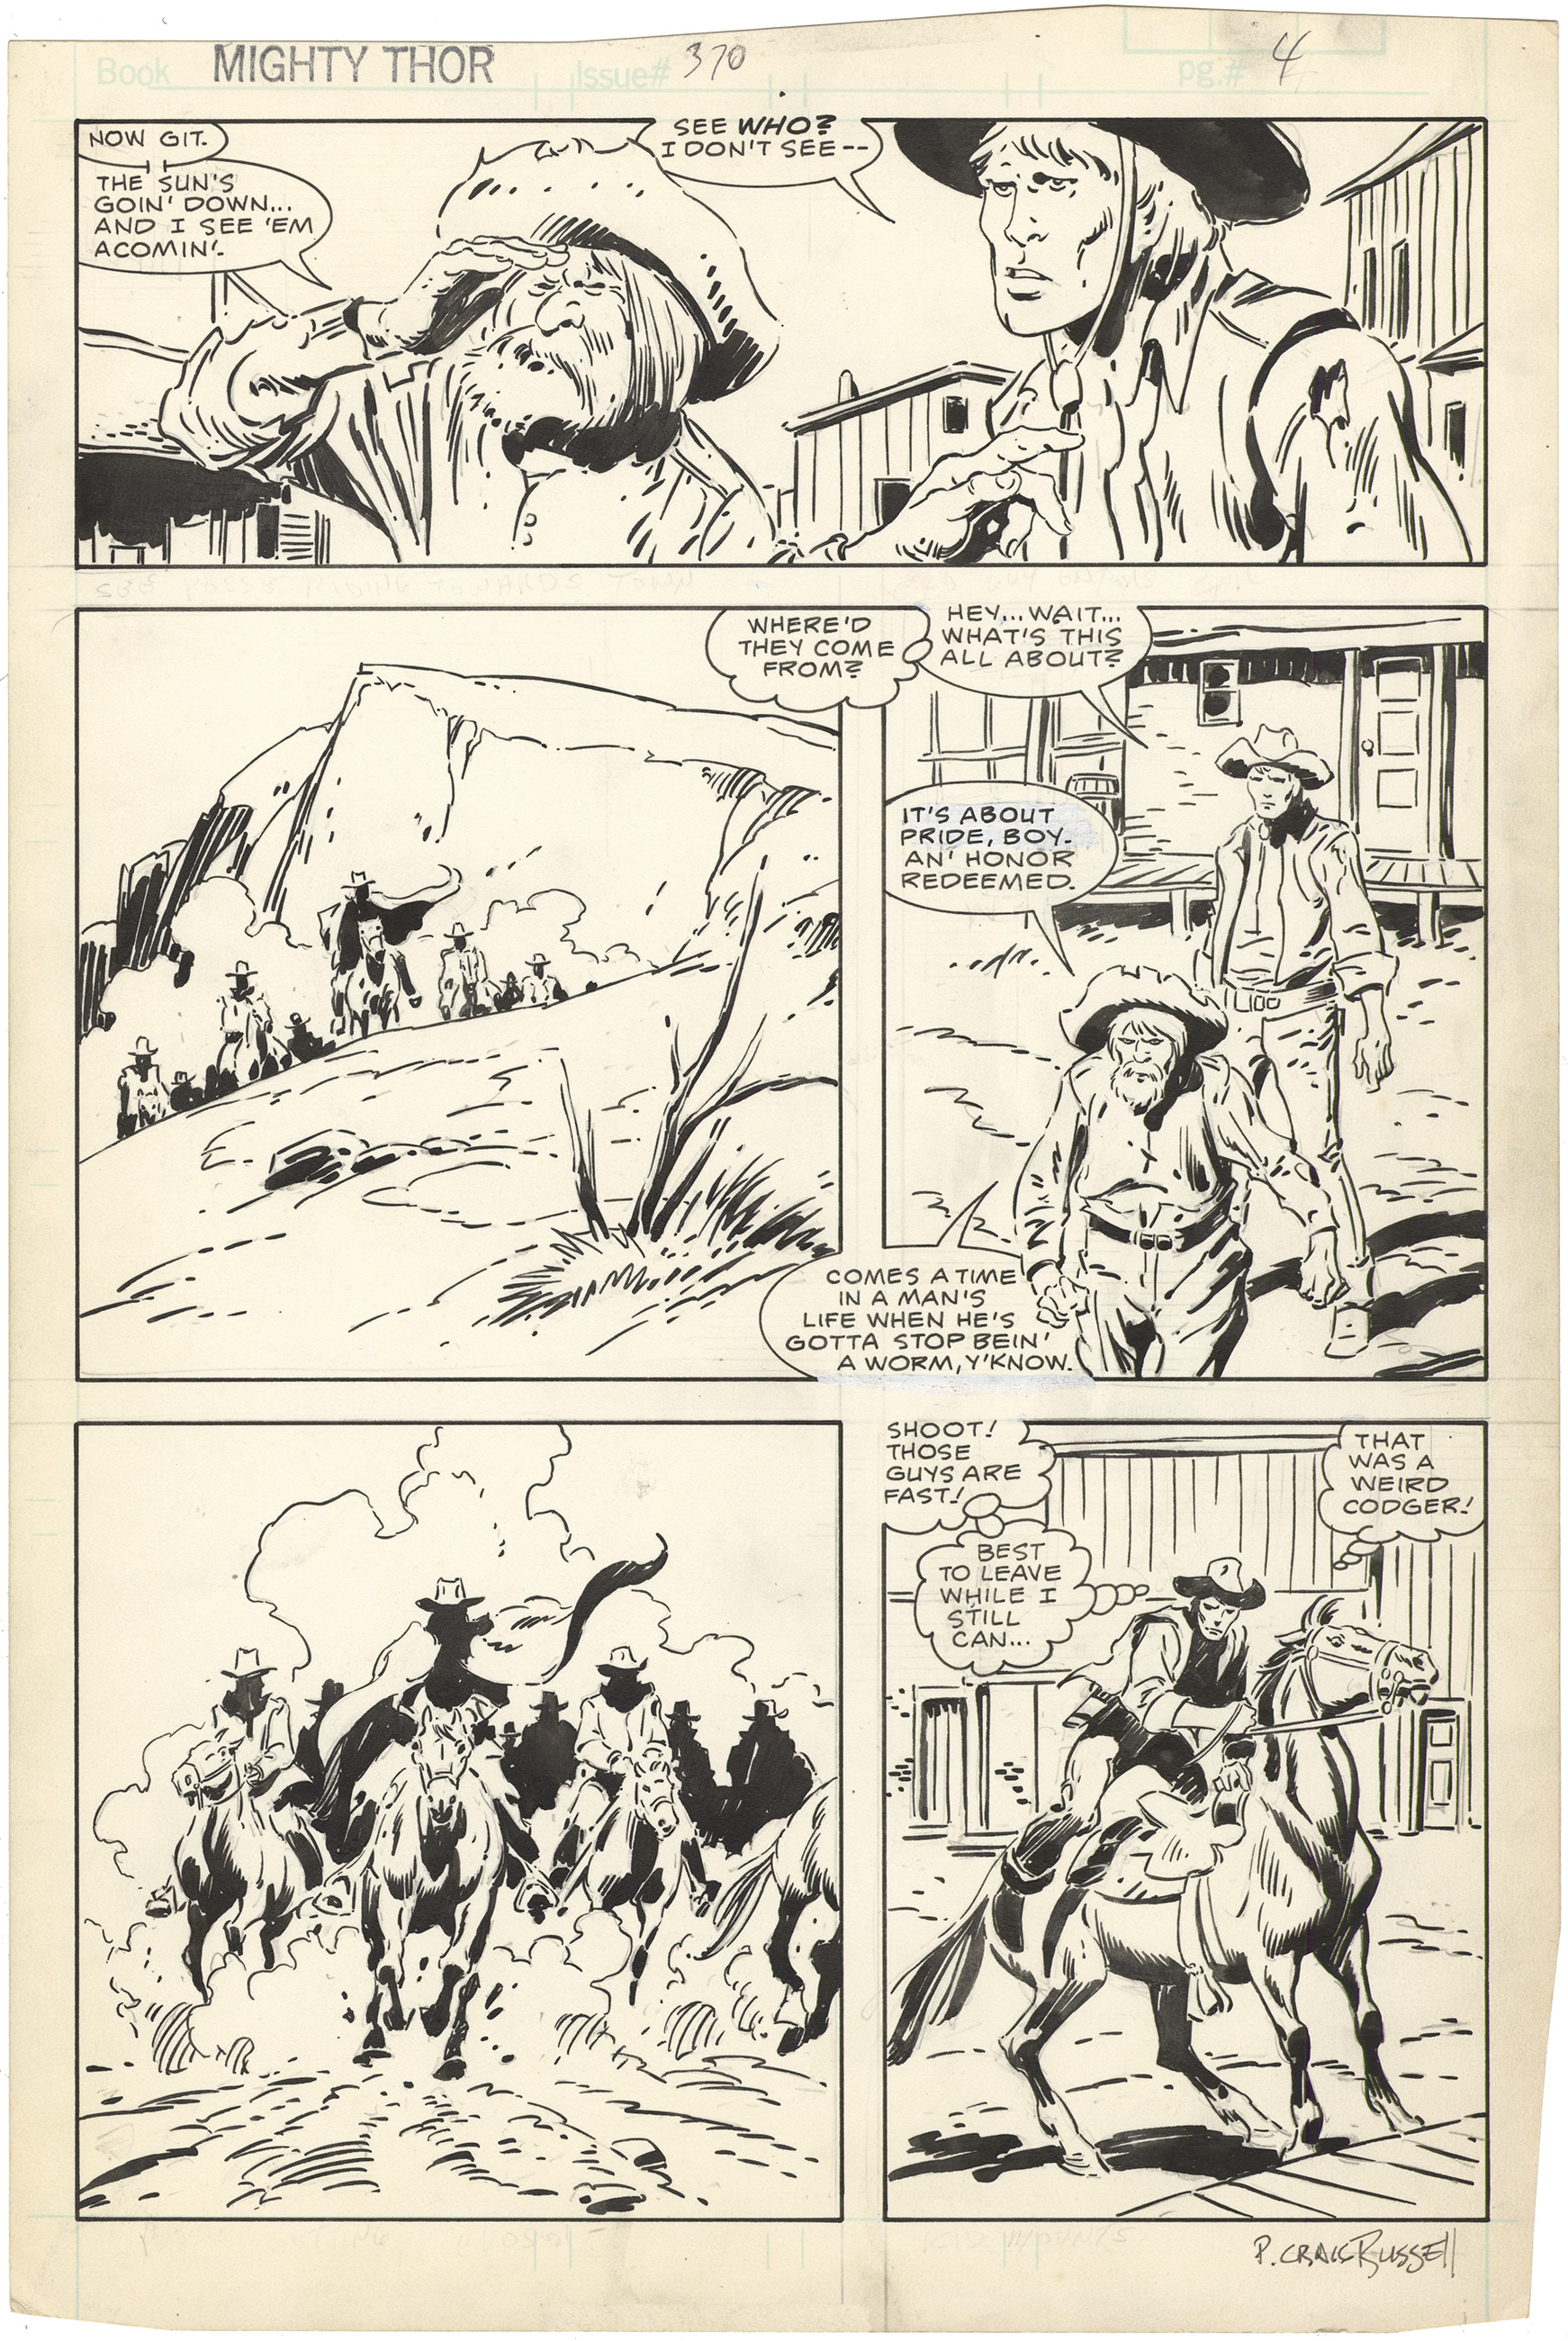 Thor #370 p4 (Signed)